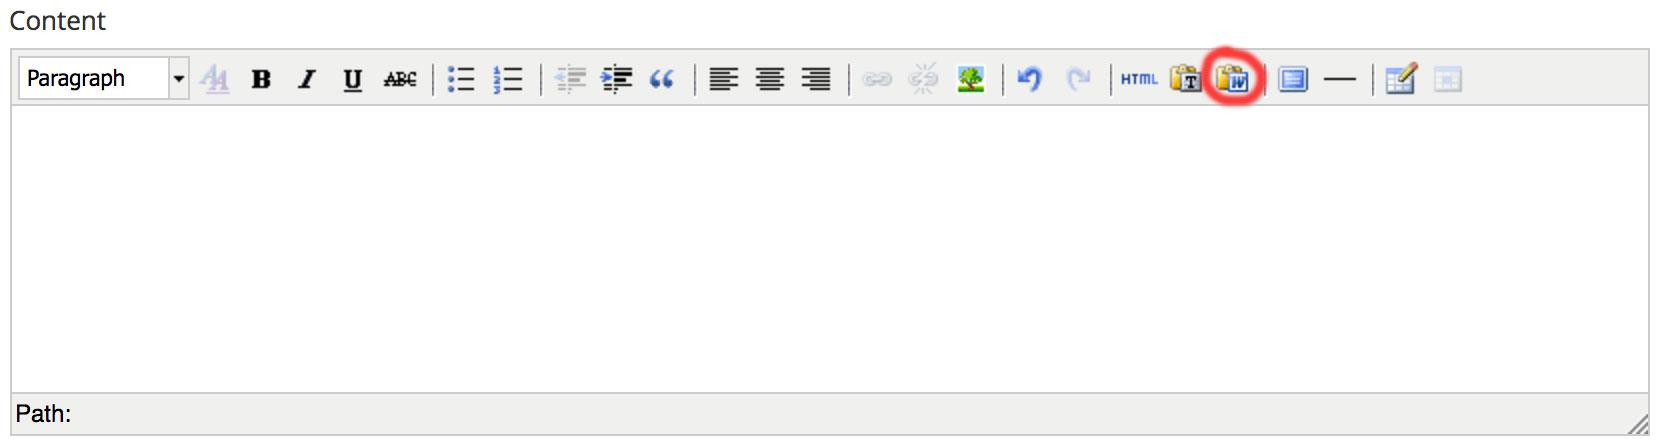 nb-mega-theme-docs-content-editor.jpg